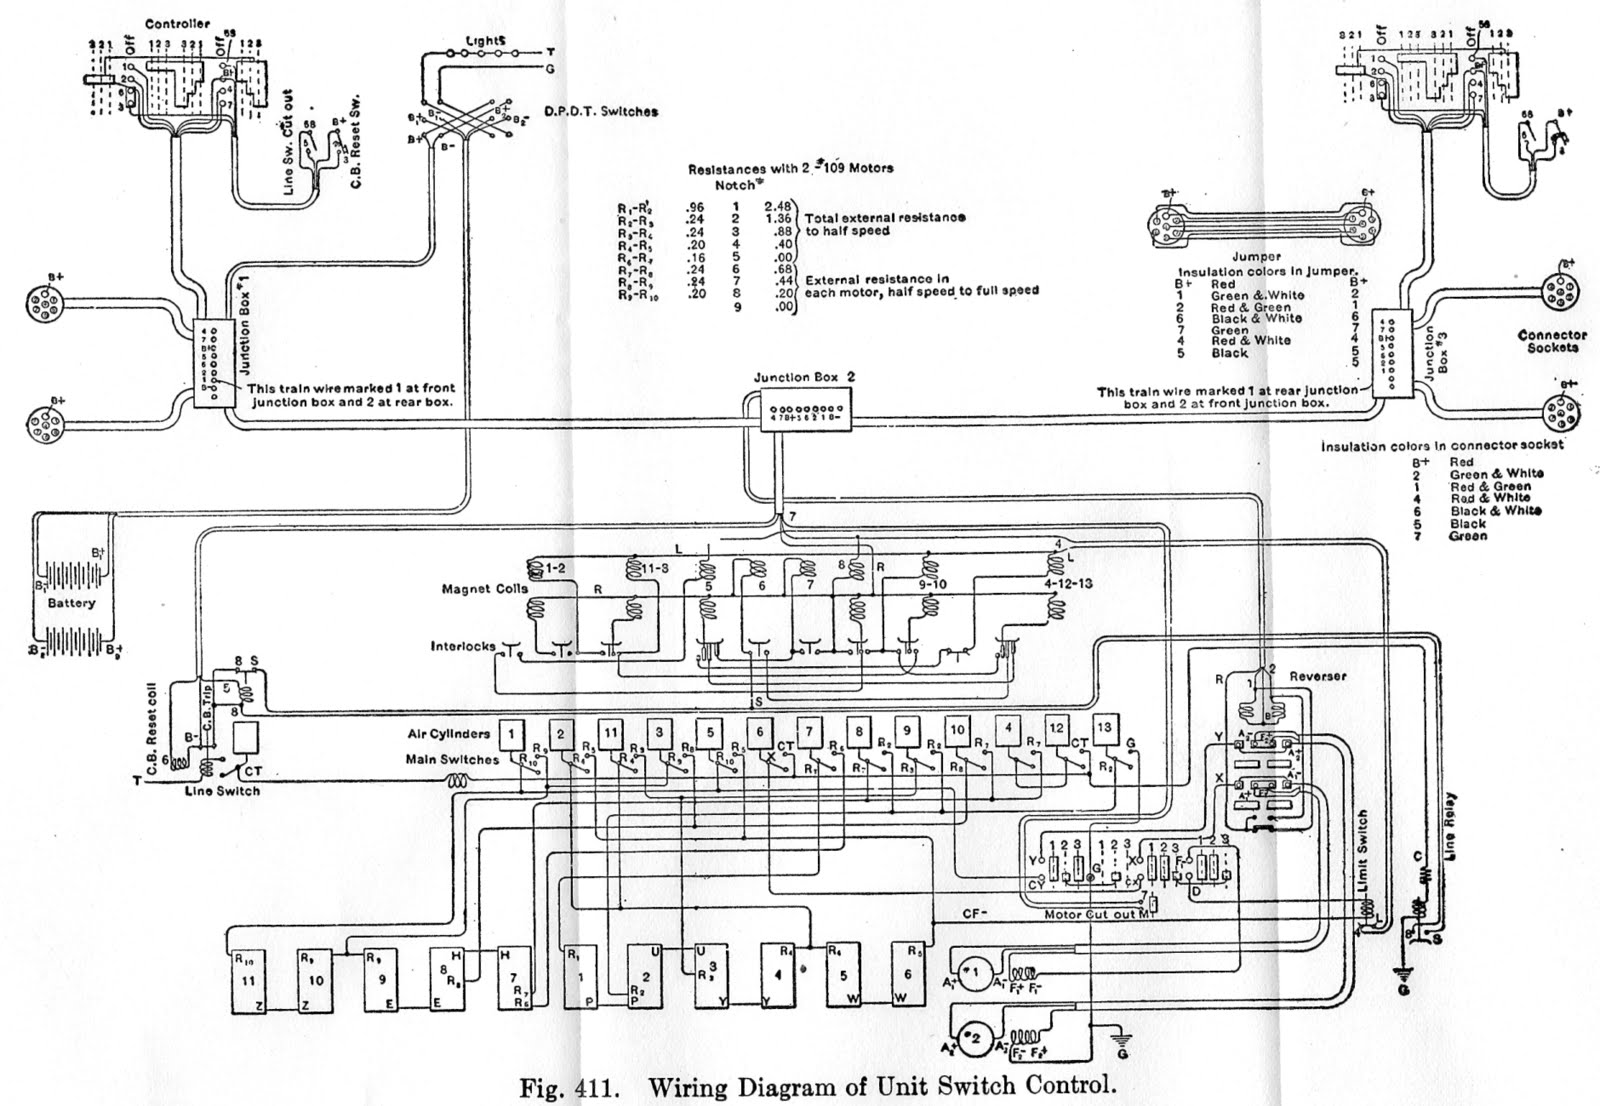 Hicks Car Works: Control Circuit Diagrams